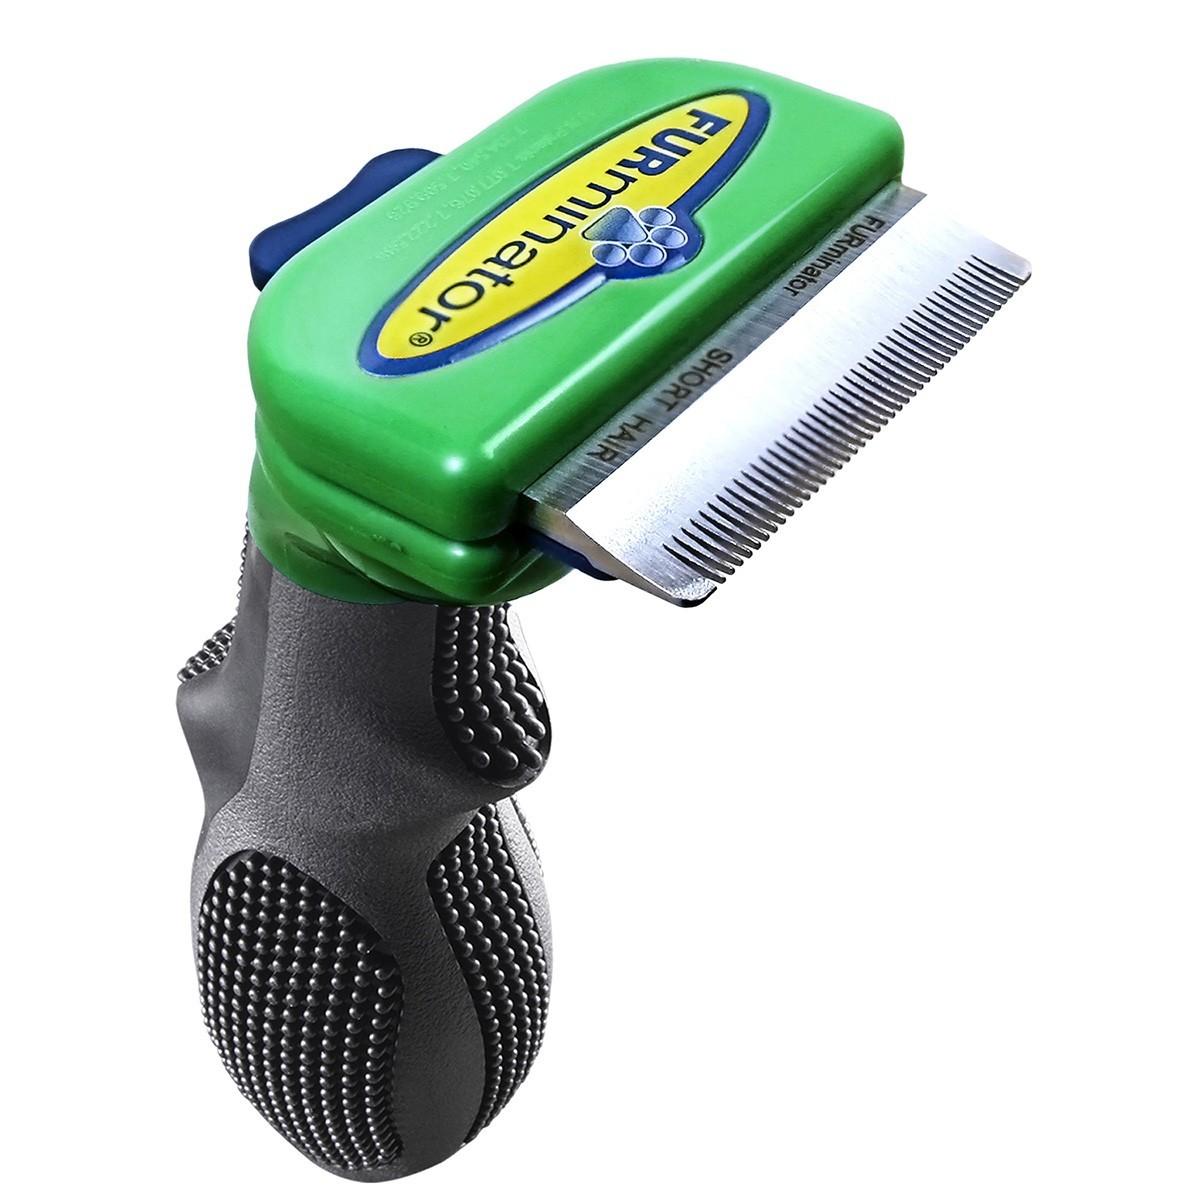 Furminator FURminator для собак мелких длинношерстных пород Long Hair Small Dog 4 см furminator-para-caes-pequenos-de-pelo-curto.jpg